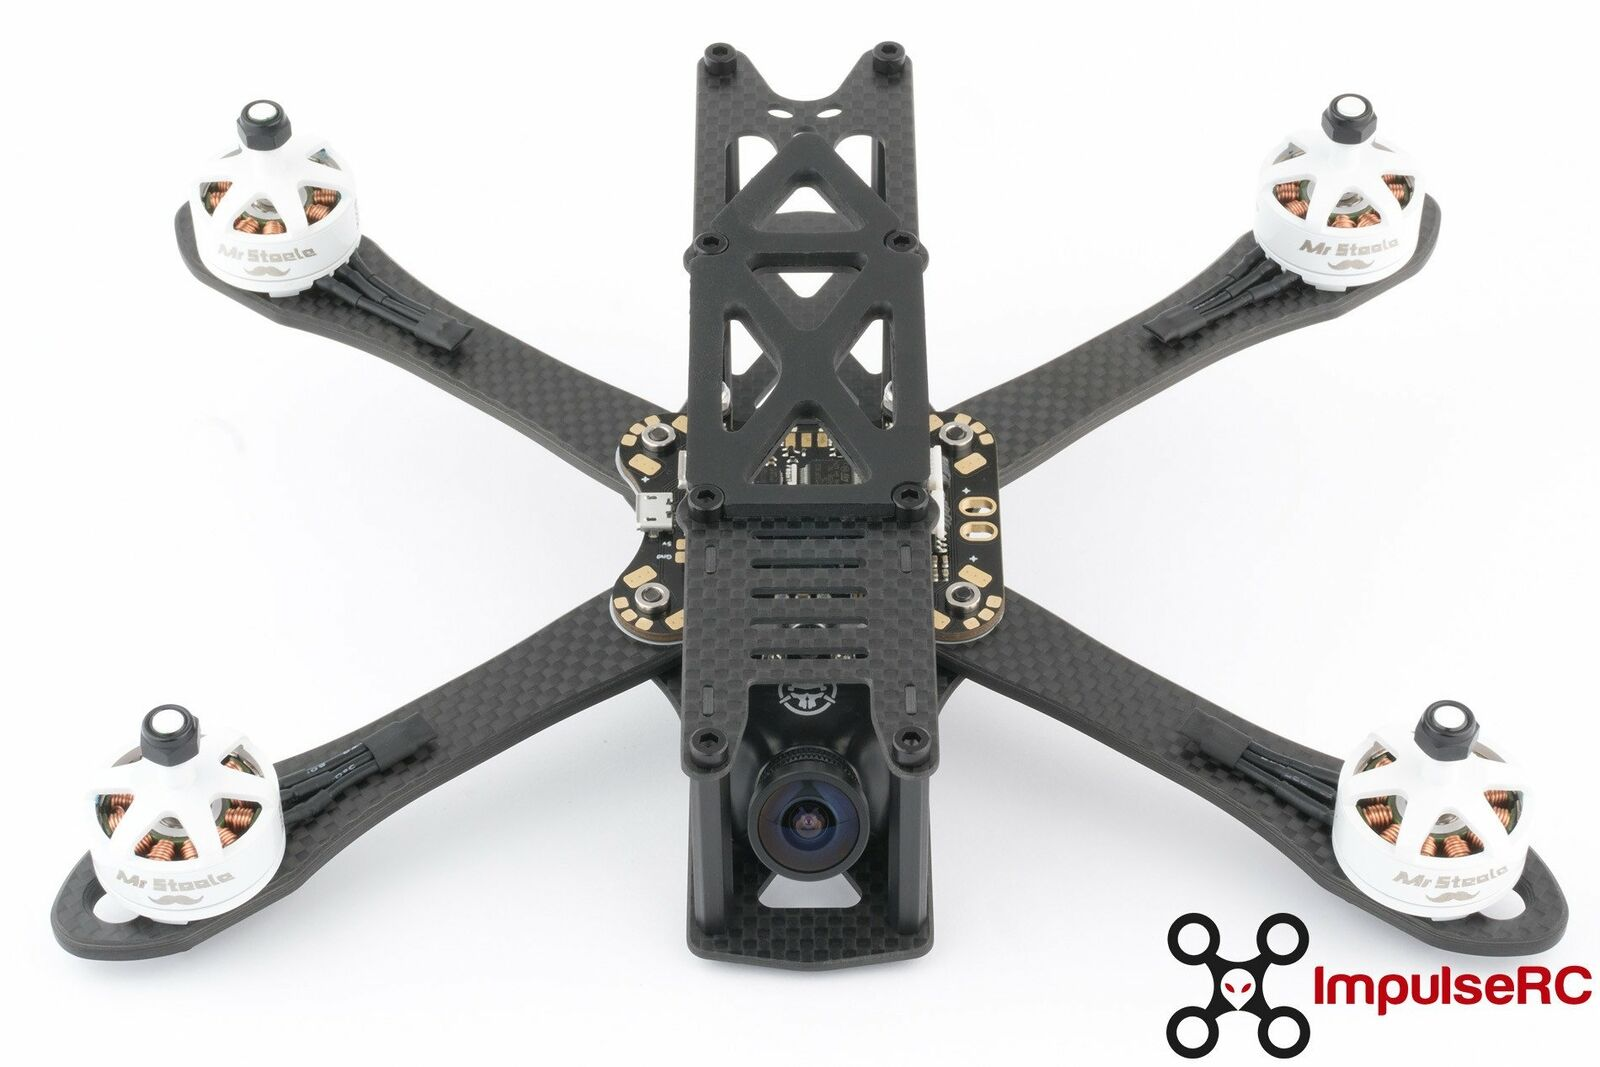 vendita online ImpulseRC Mr Steele edizione 5  Alien Frame Frame Frame Kit + Kiss PDB with OSD  promozioni di squadra